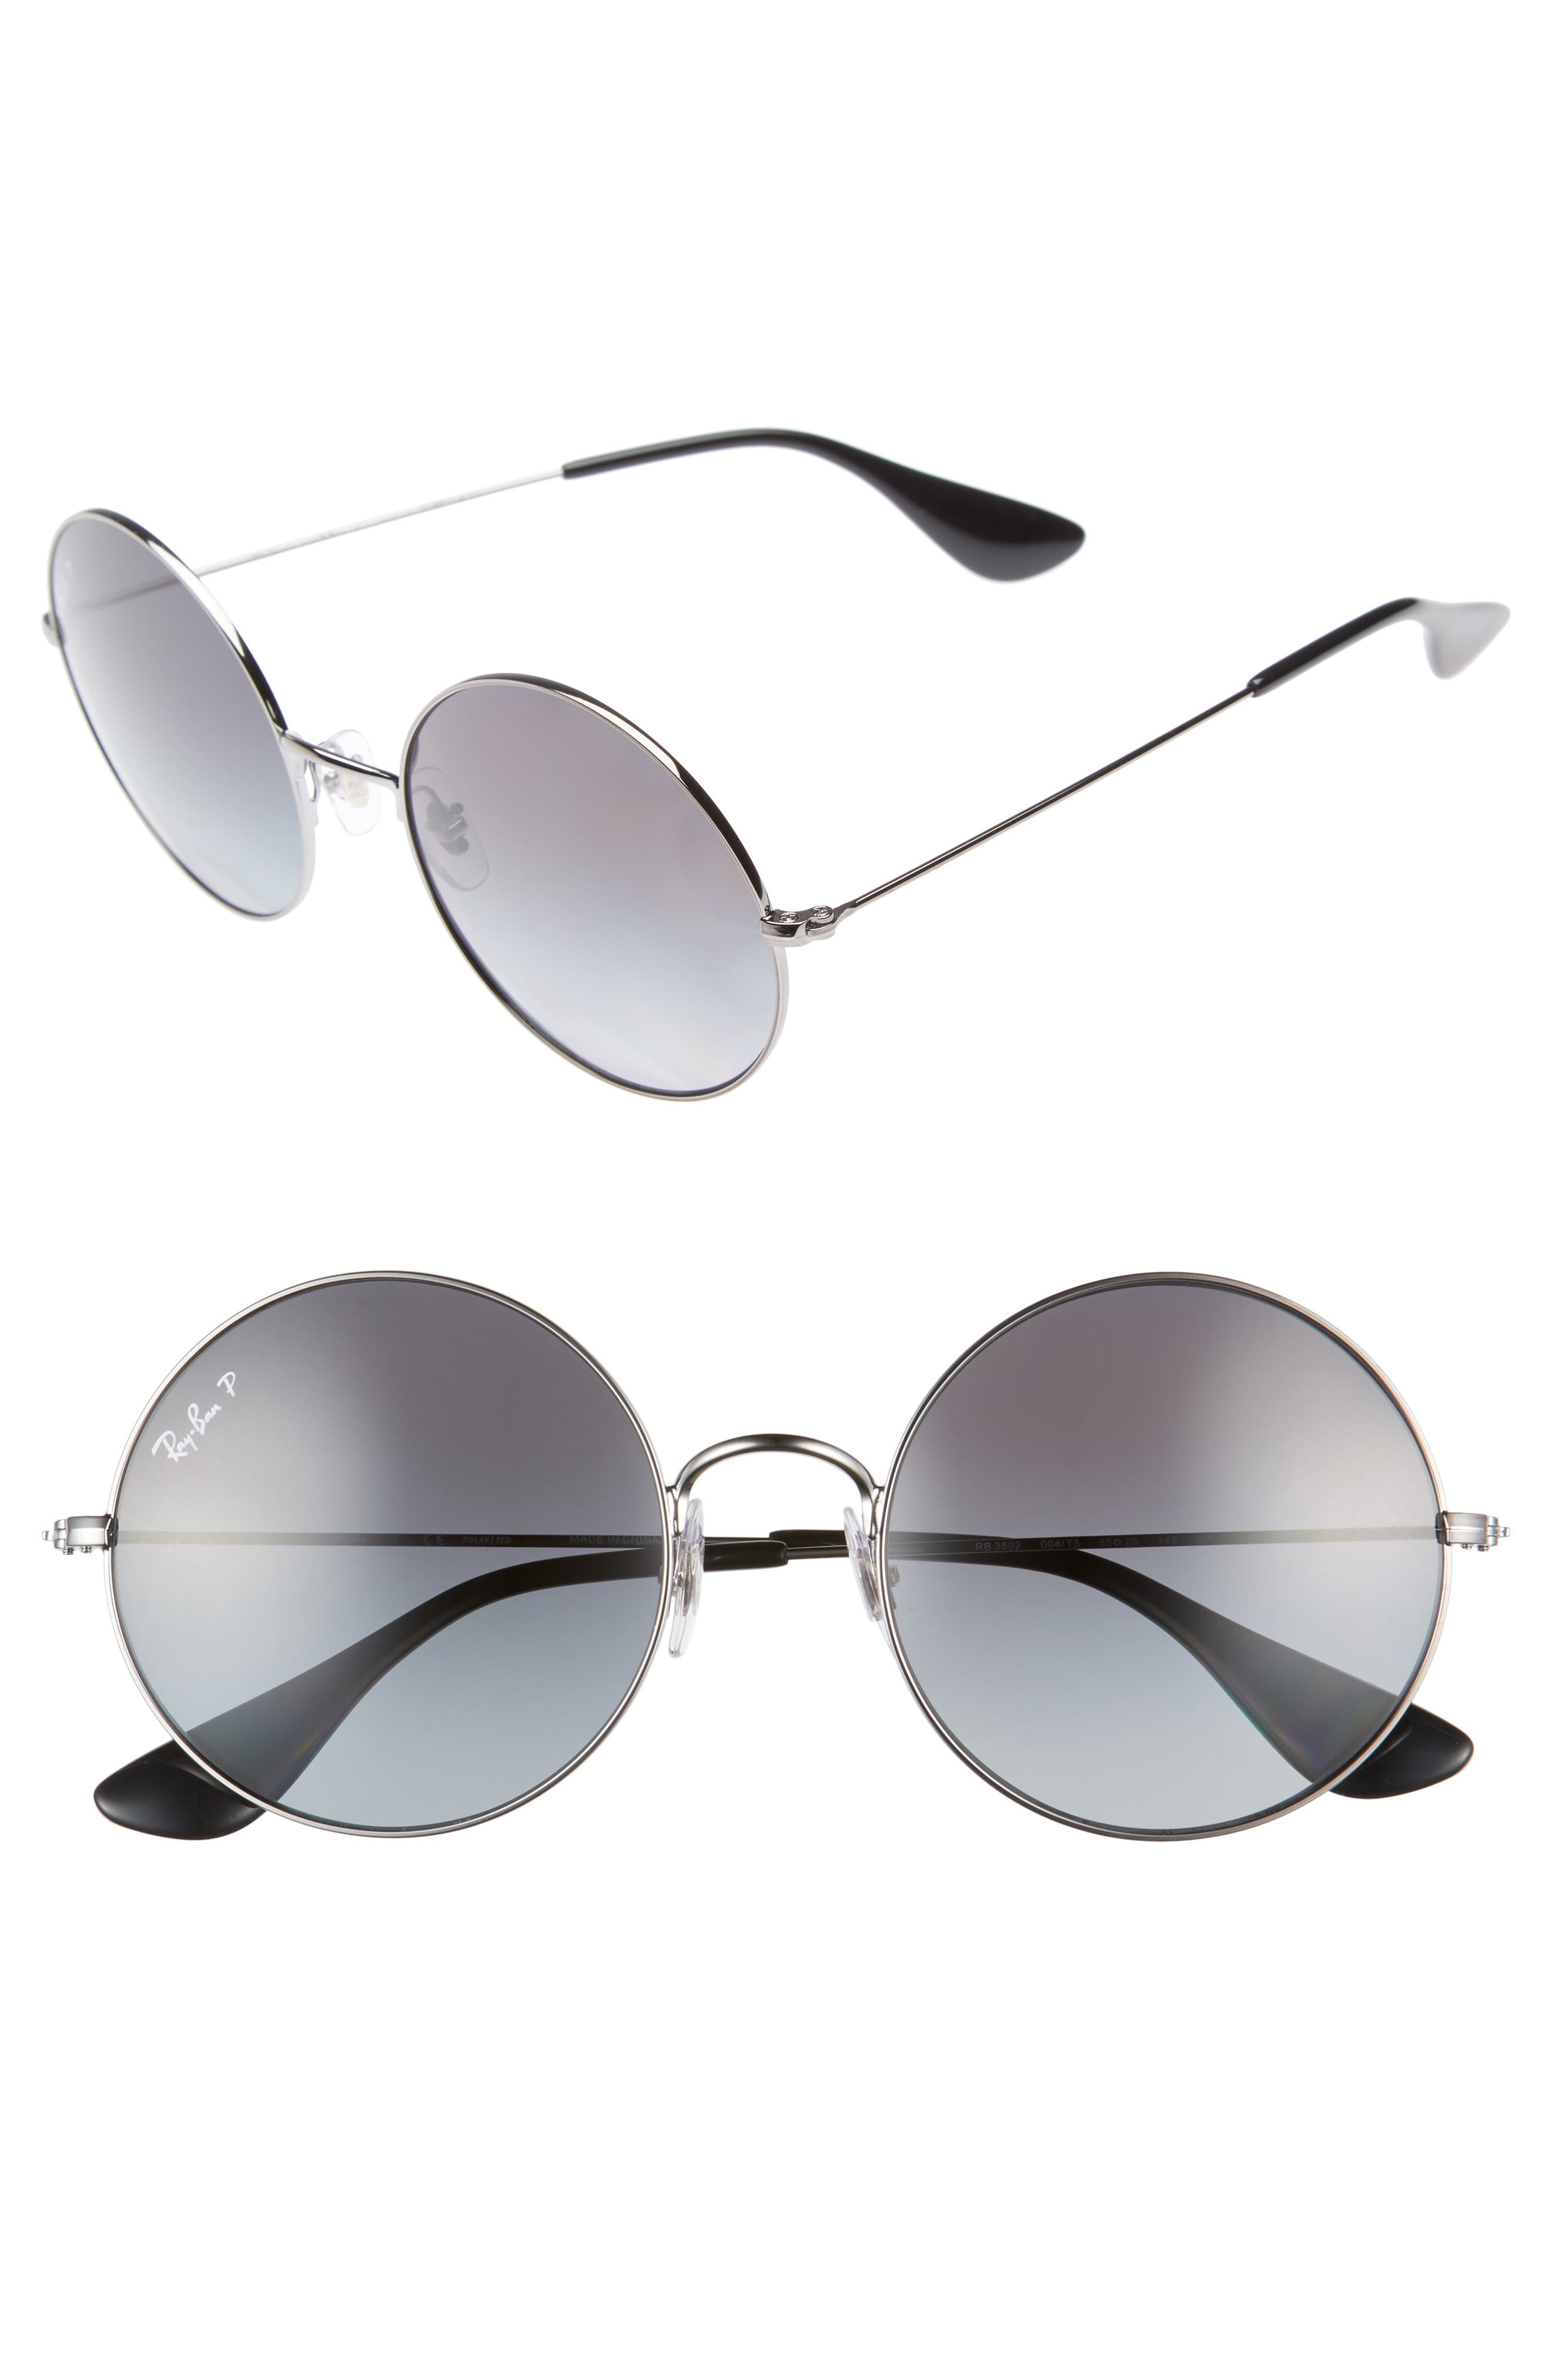 55mm Polarized Round Sunglasses,                             Main thumbnail 1, color,                             020